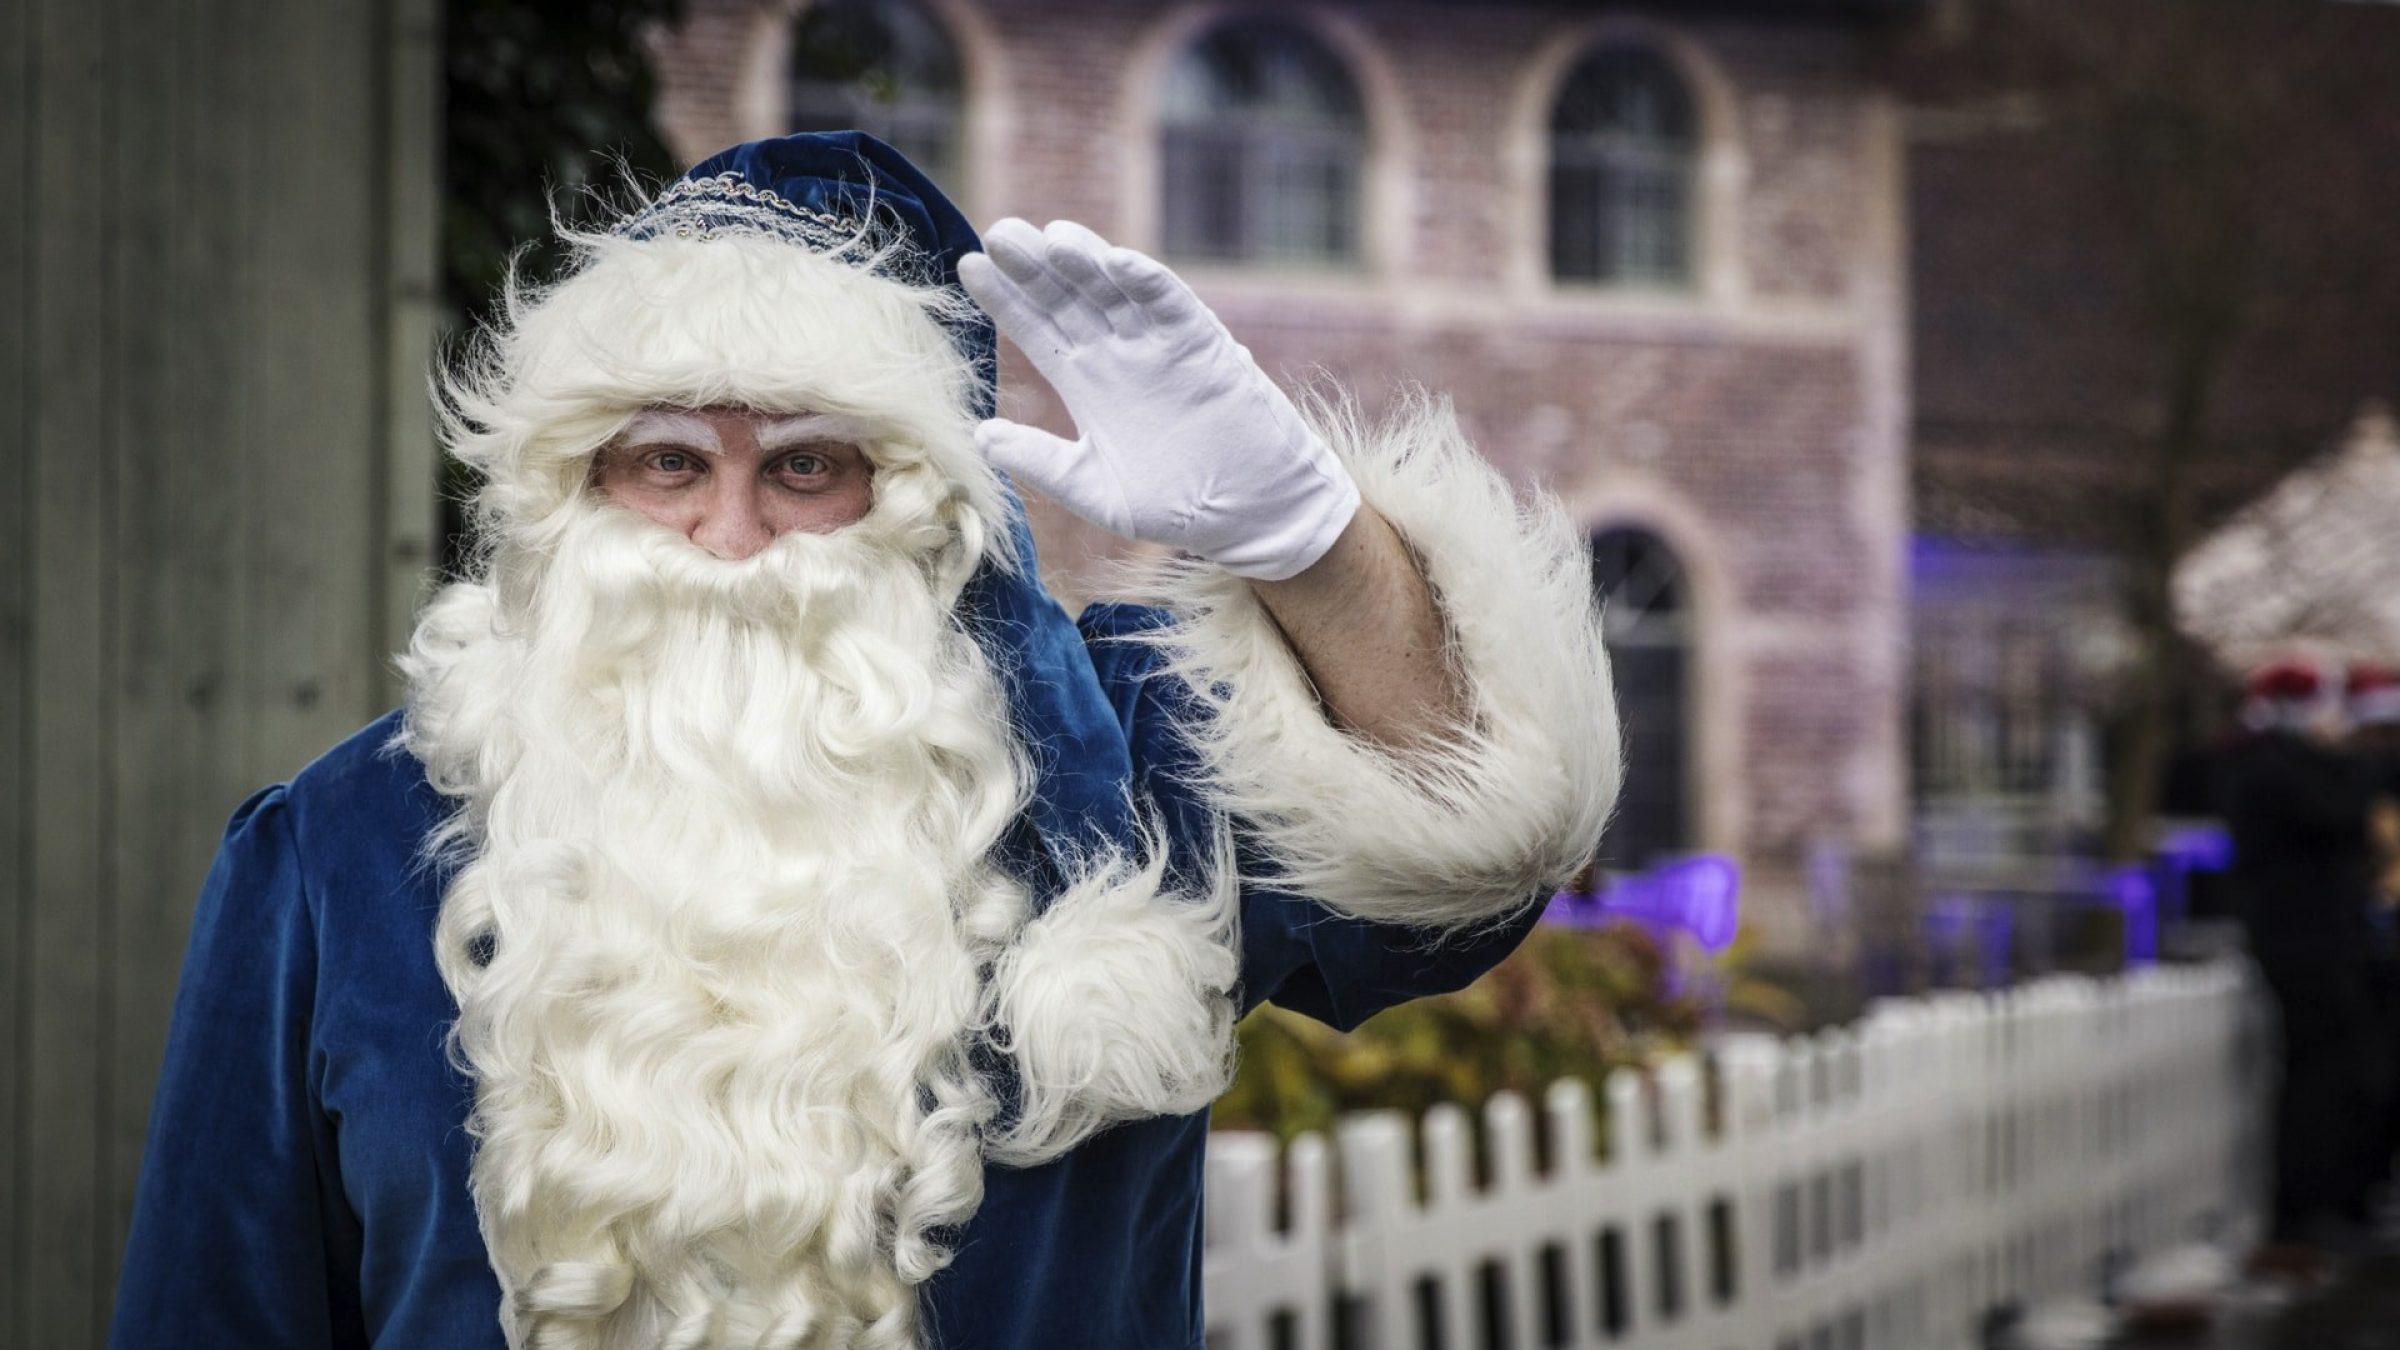 Fast Forward Evenementenbureau Gent Samsung Intern Bedrijfsfeest Kerstfeestsamsung Kerstfeest 2